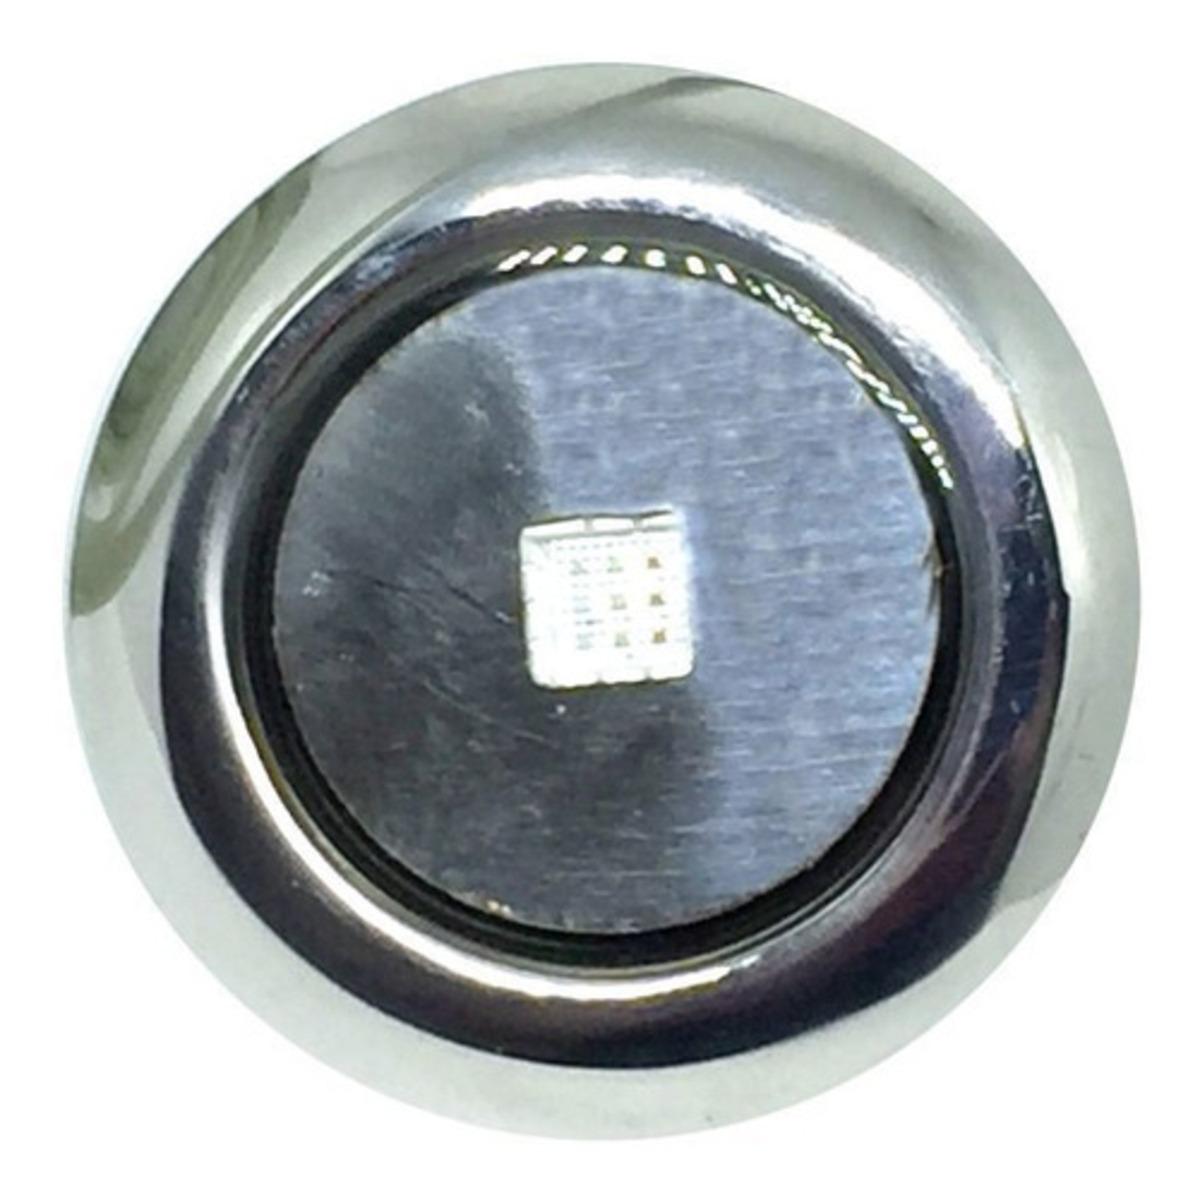 "Refletor Mini Steel Square Led 10w Inox com Plug 1/2"" Pooltec"